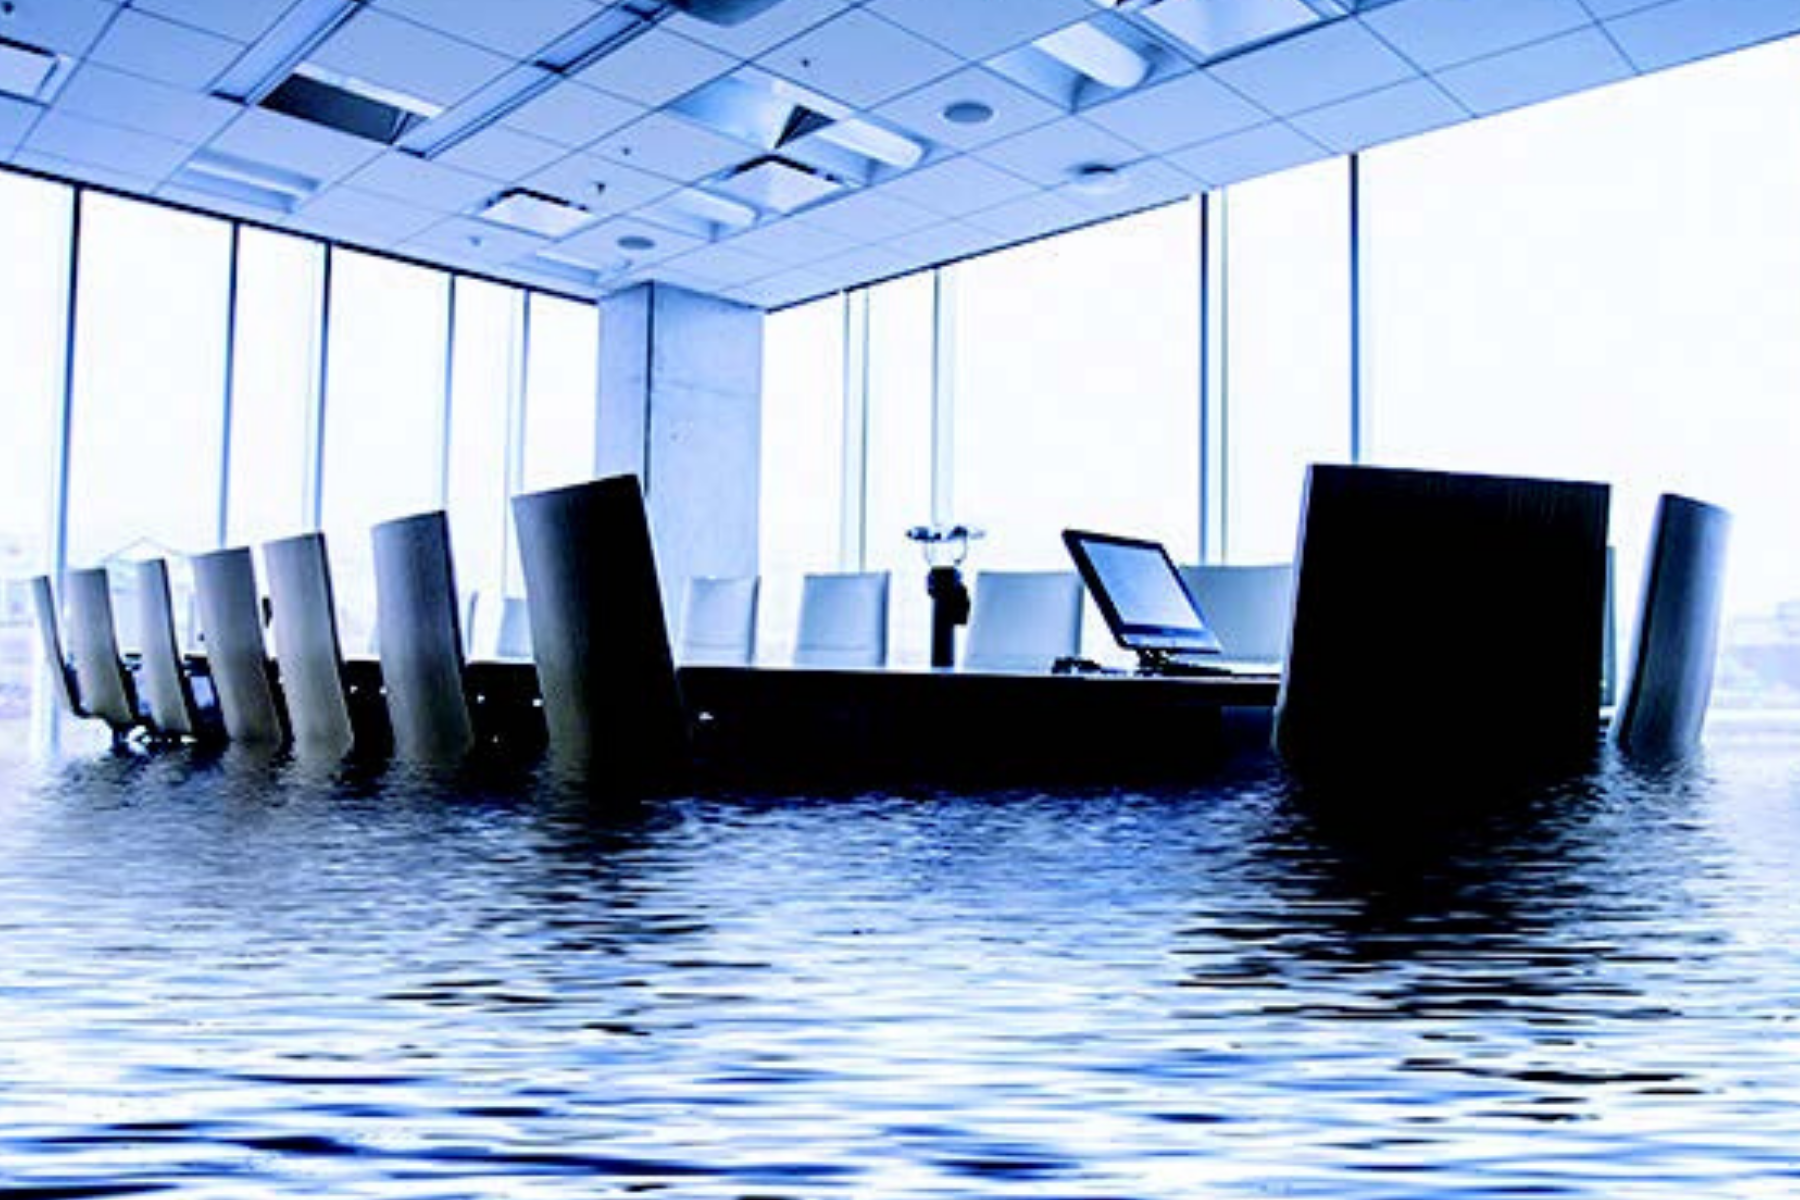 Commercial Real Estate Water Damage Risks